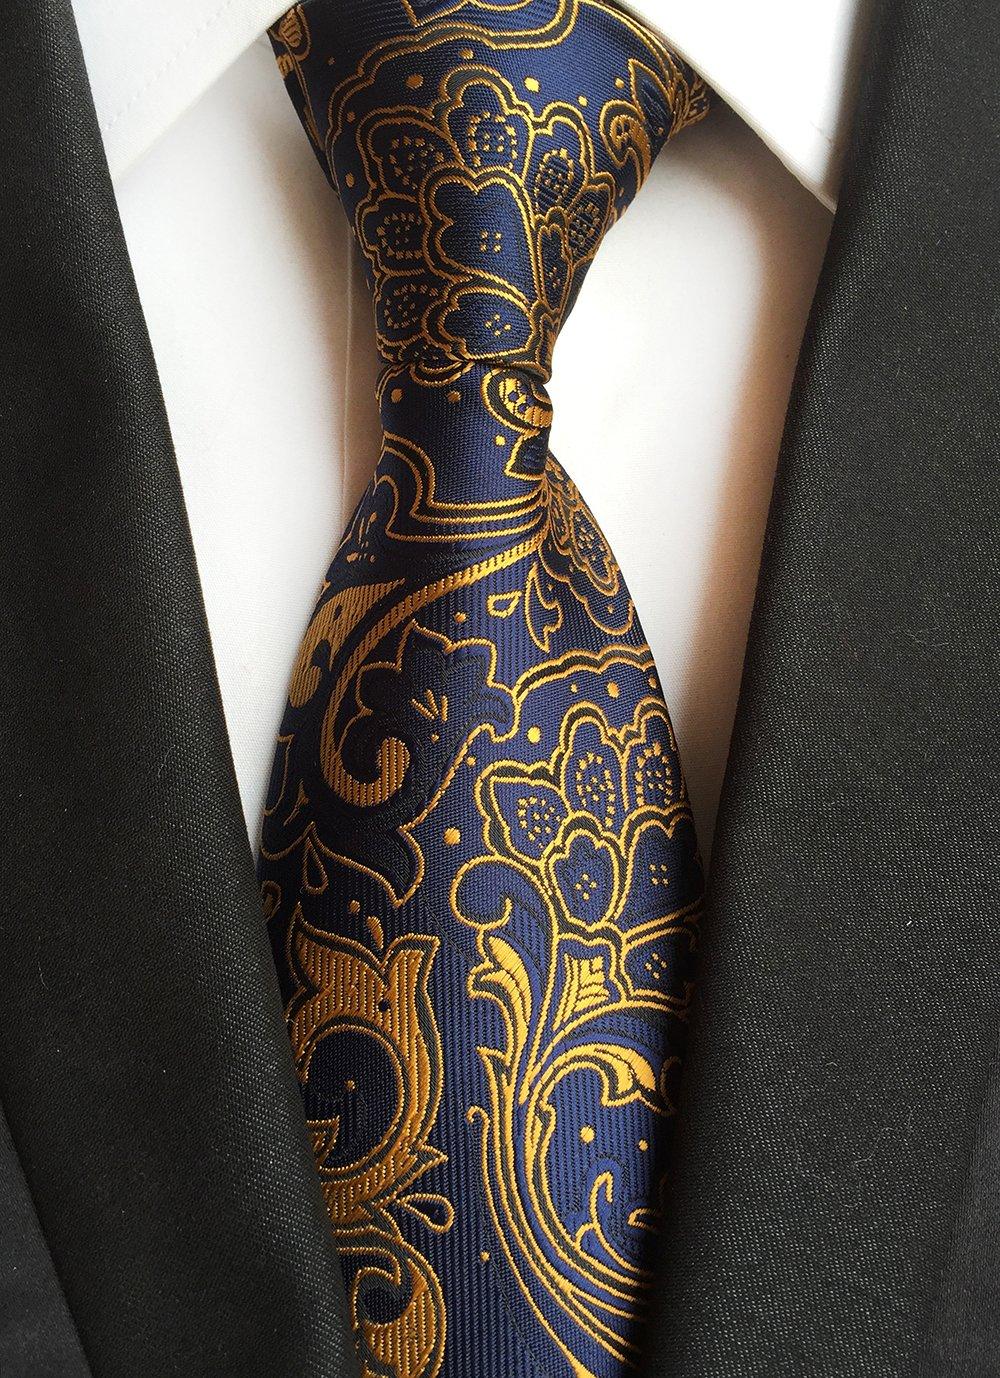 Paisley Ties for Men Jacquard Woven Necktie FXICAI Business Fashion Classic Casual Tie Bar Clip Set (Golden) by FXICAI (Image #2)